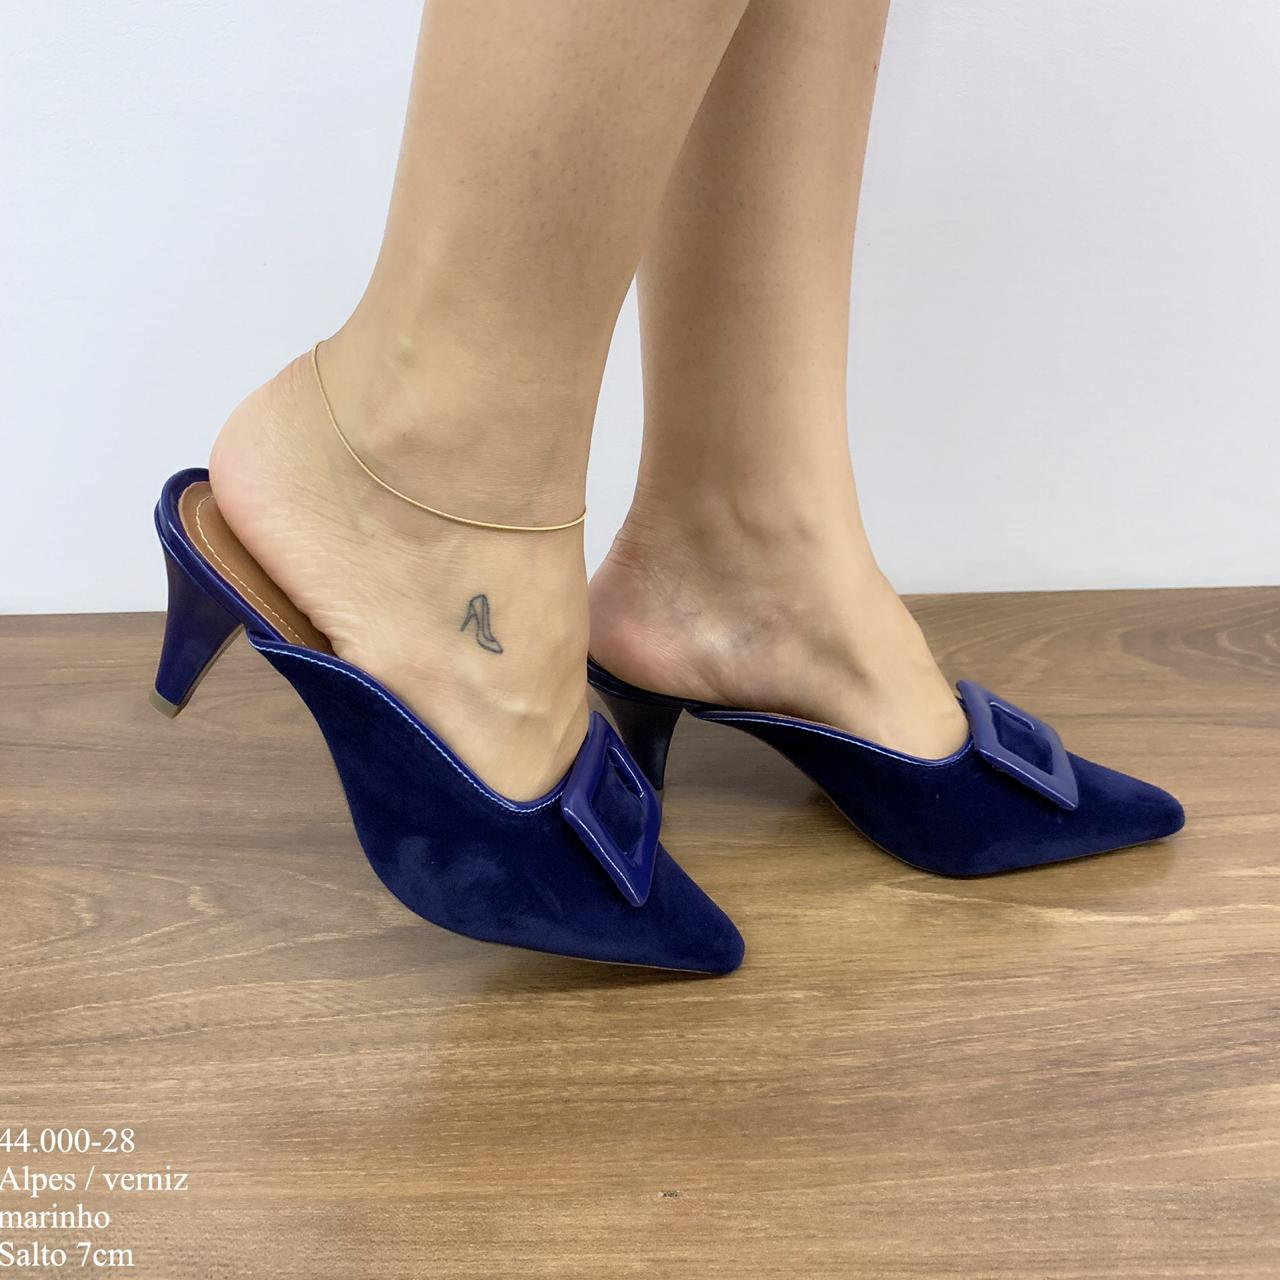 Mule Bico Fino Azul Marinho | D-44.000-28